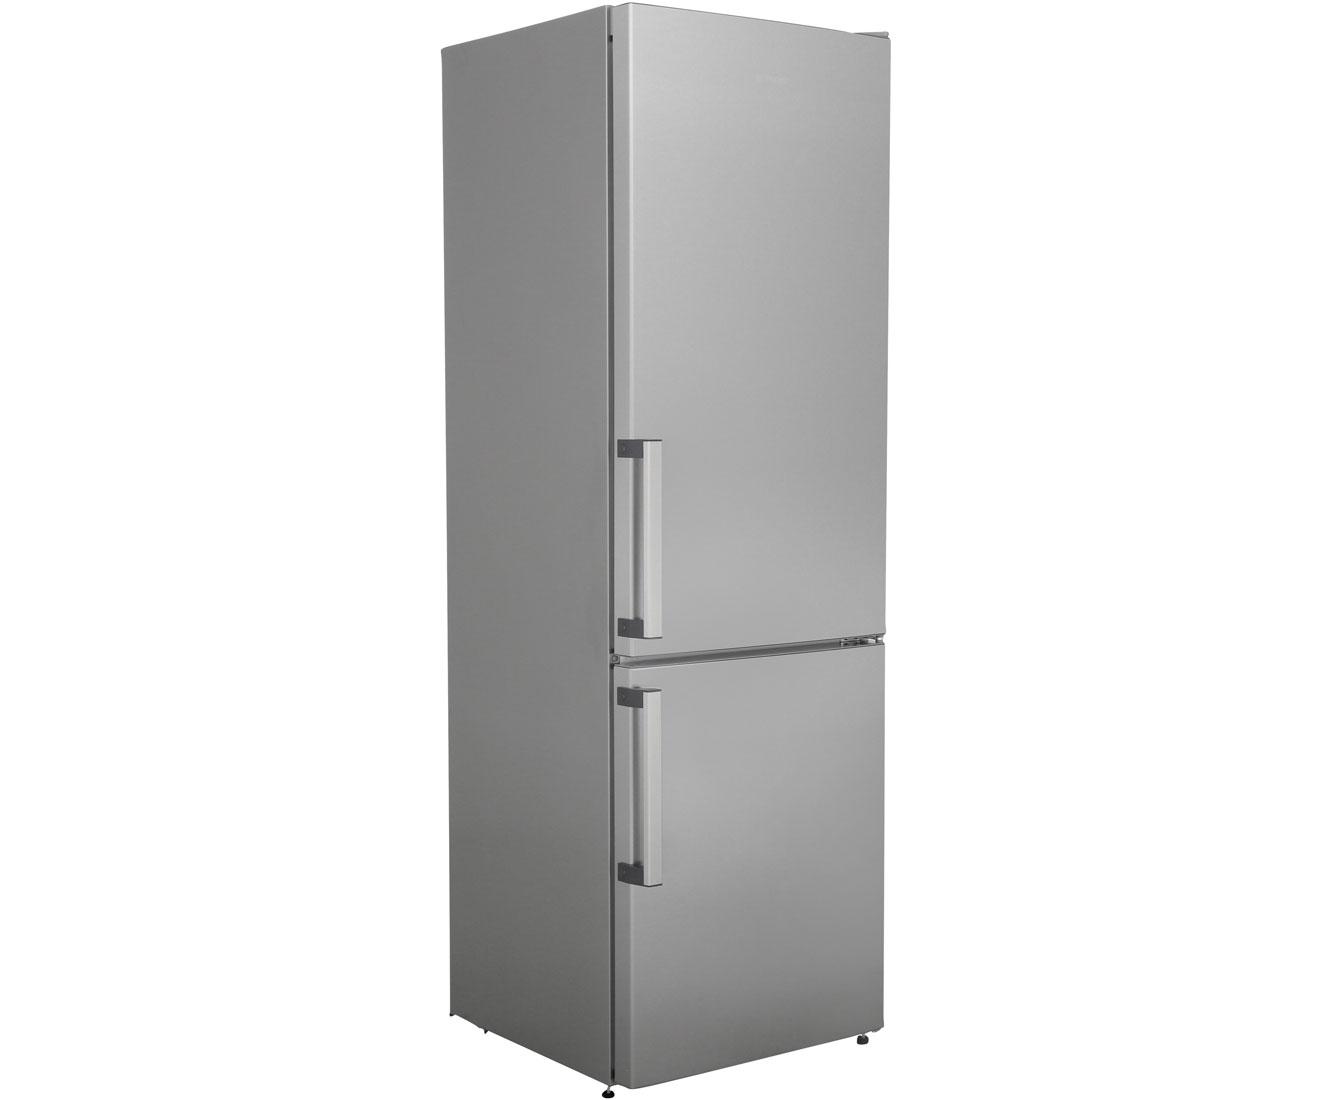 Gorenje Kühlschrank Ersatzteile : Gorenje kühlschrank ersatzteile: kühlschrank rb aw gorenje. gorenje